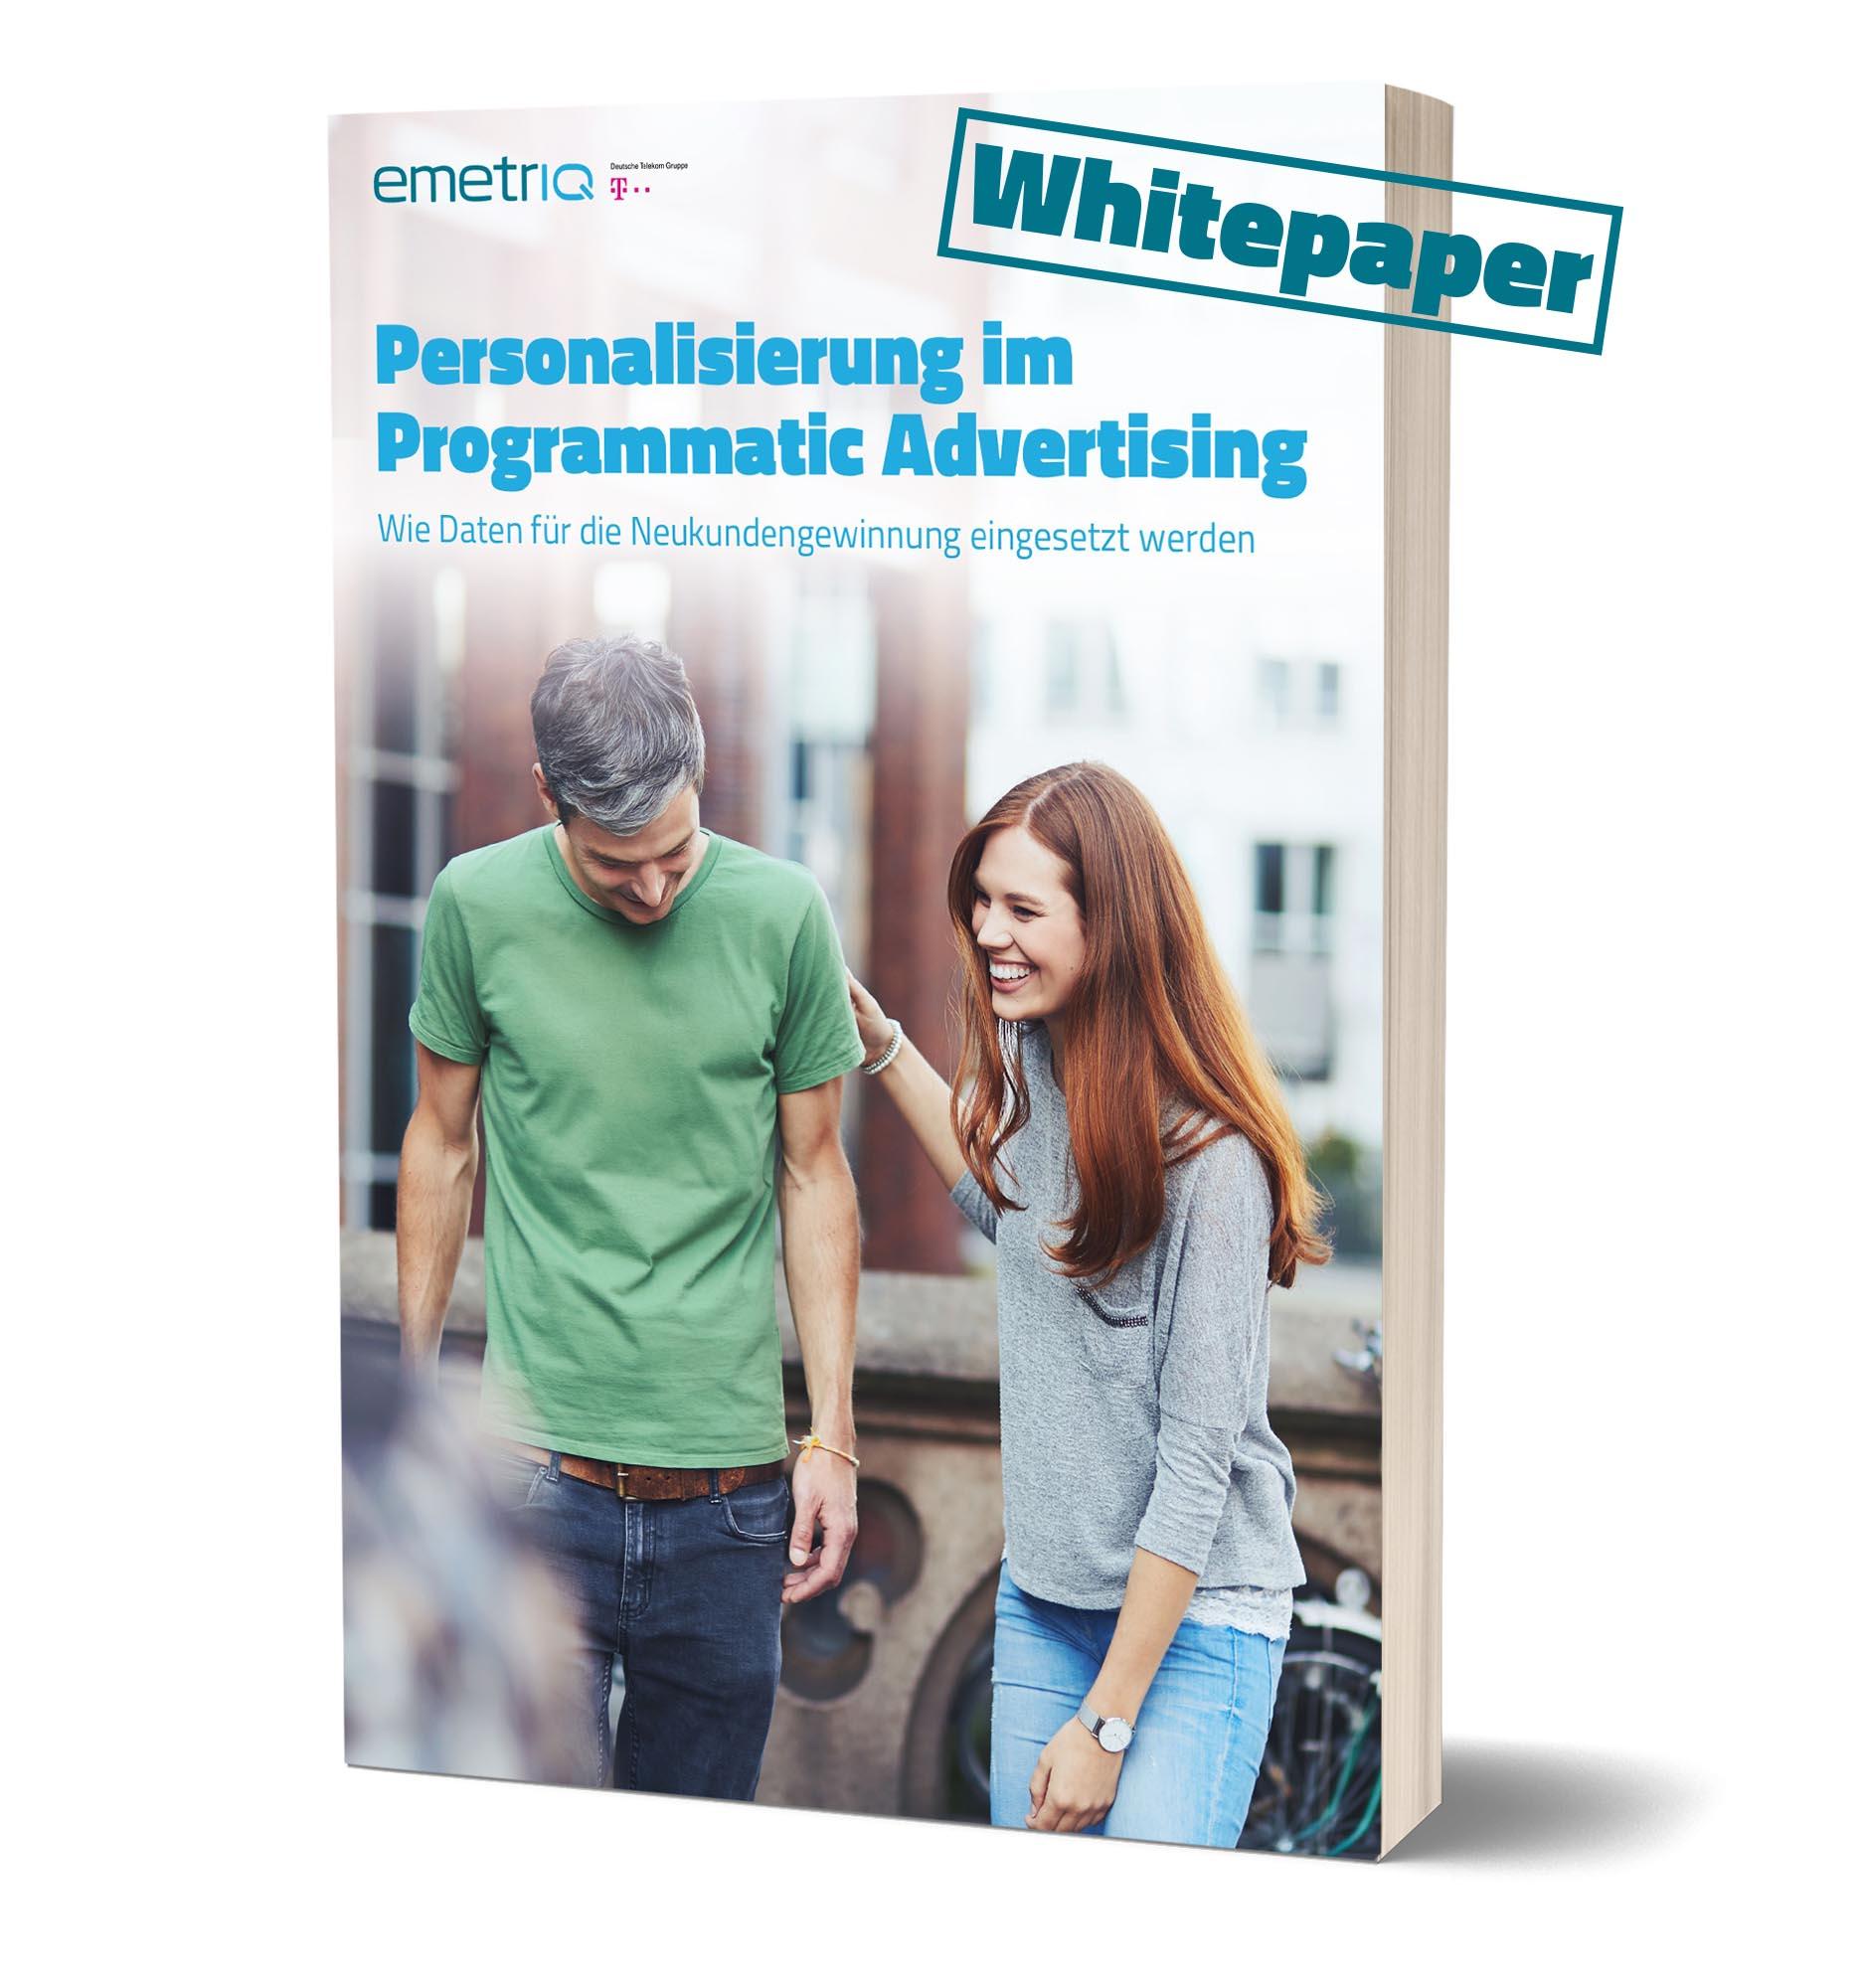 Whitepaper Personalisierung Programmatic Advertising